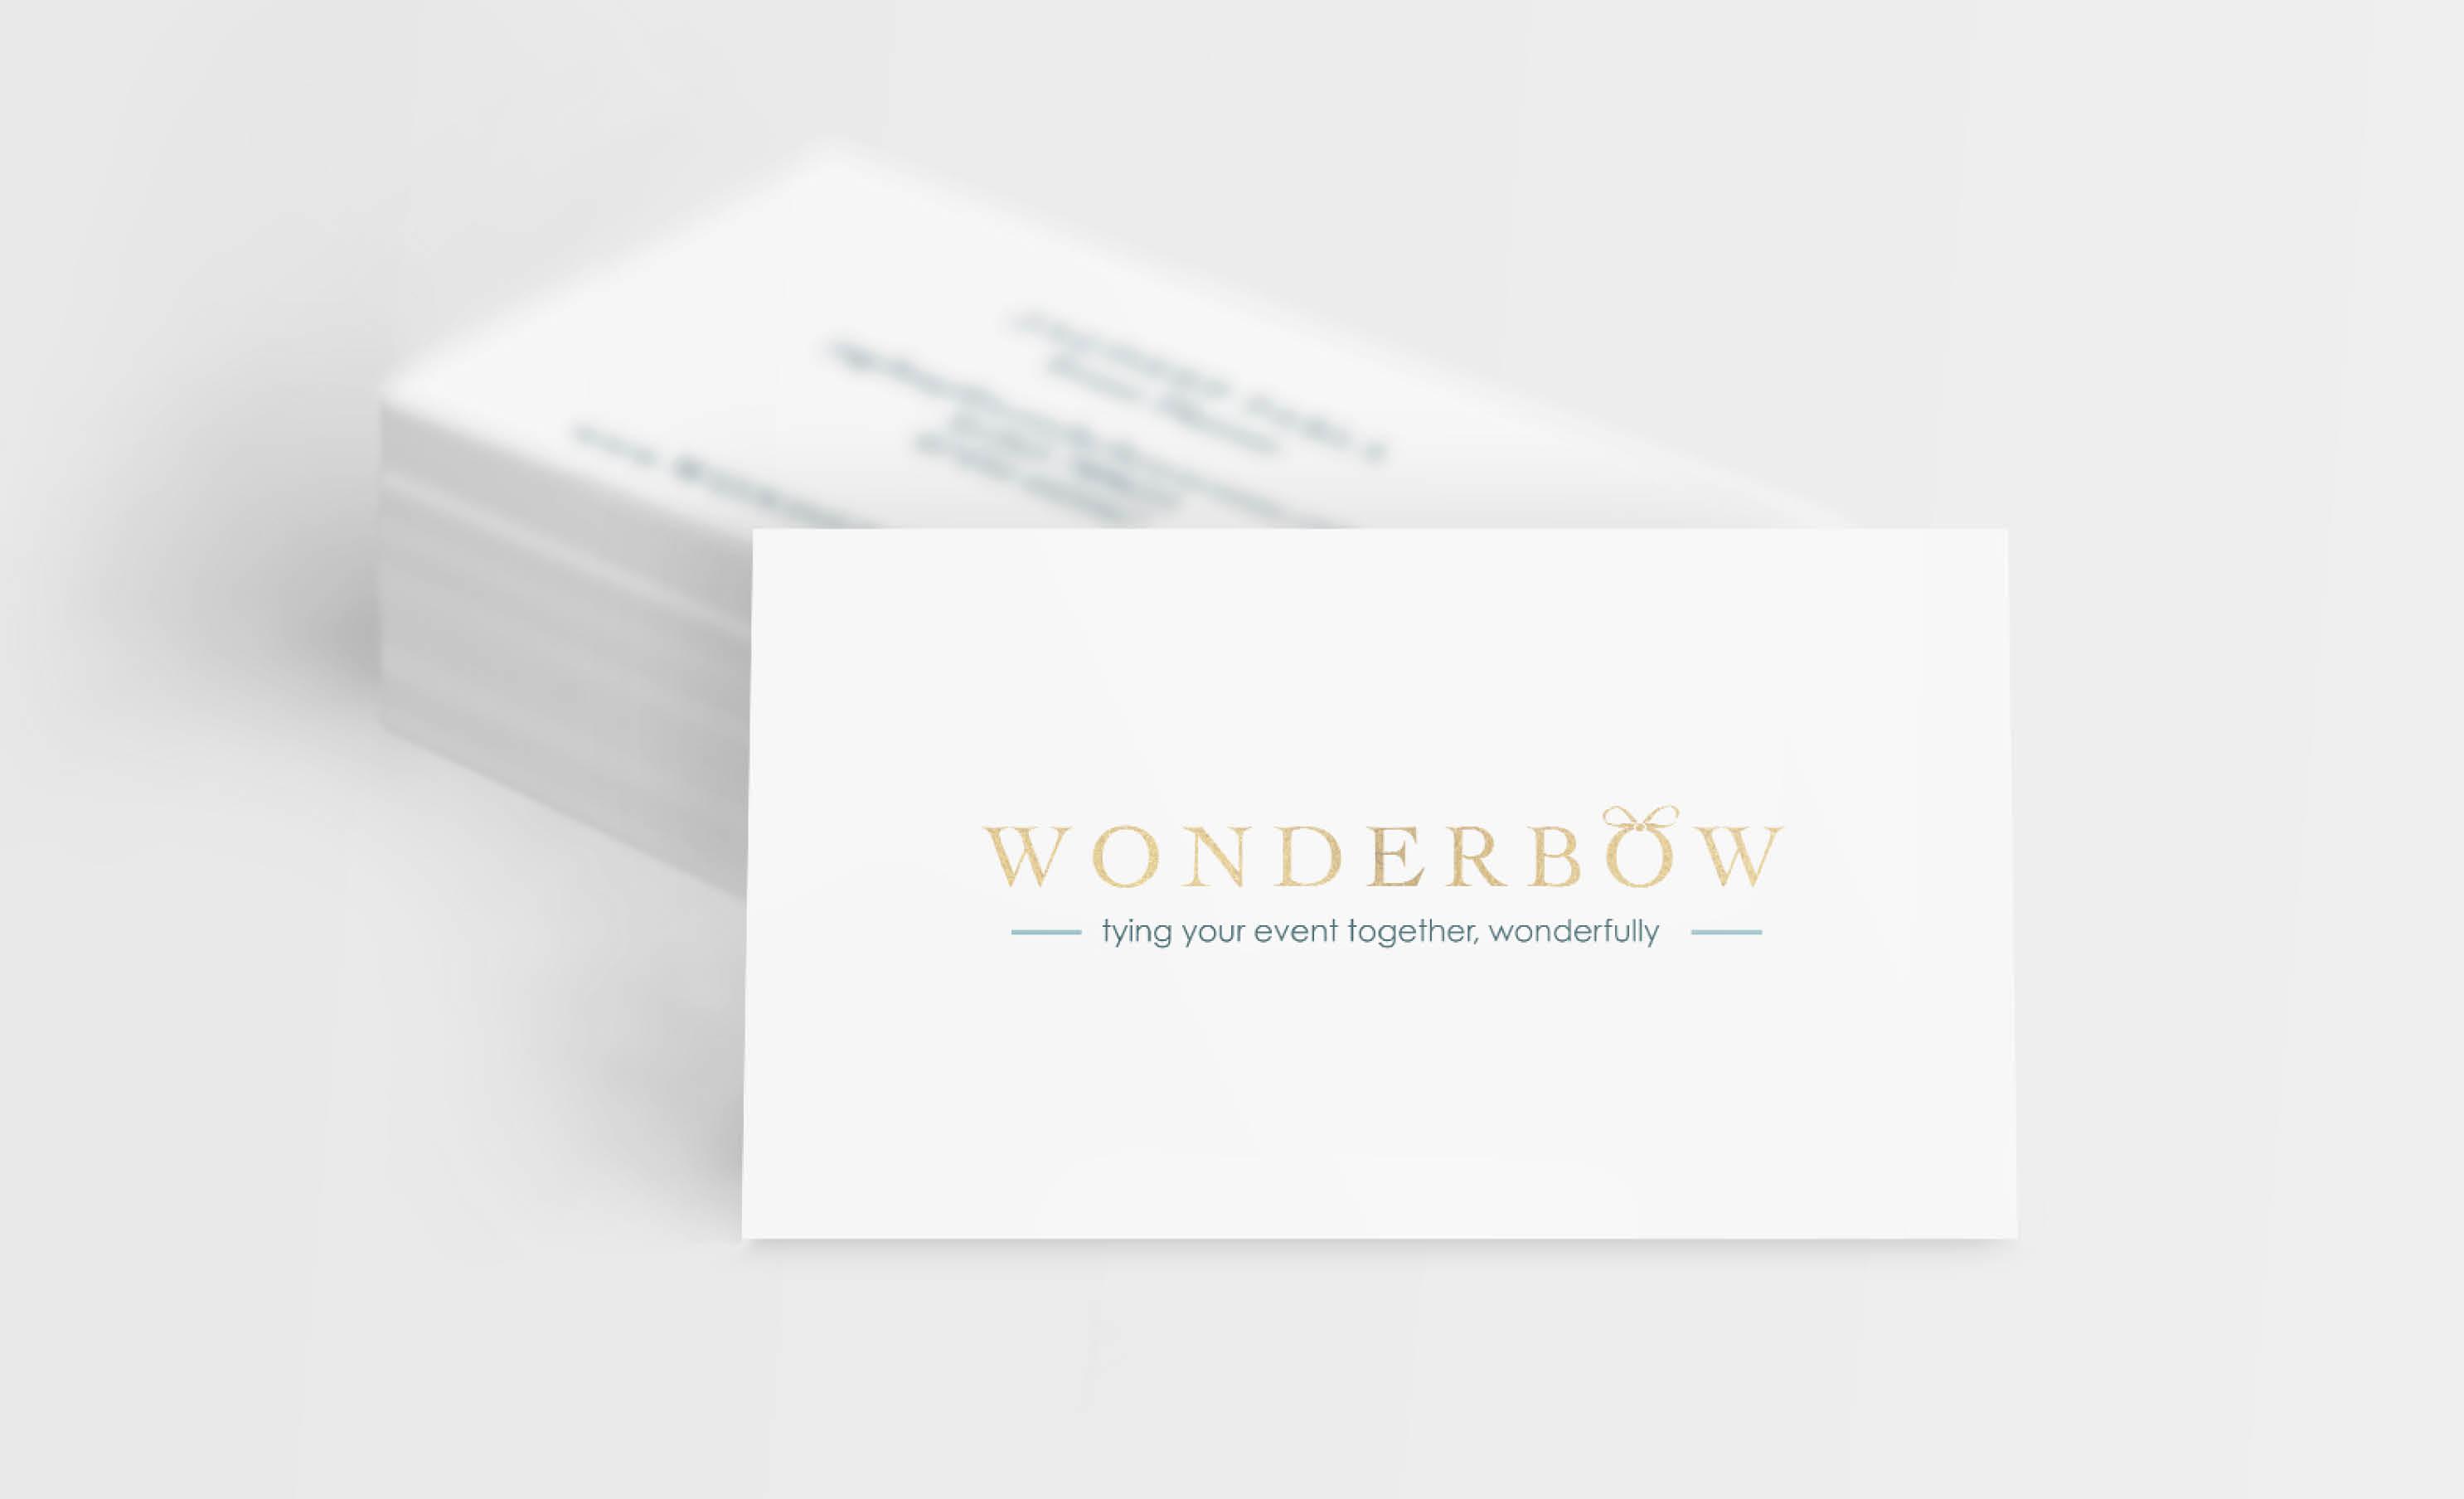 wonderbow-branddesign